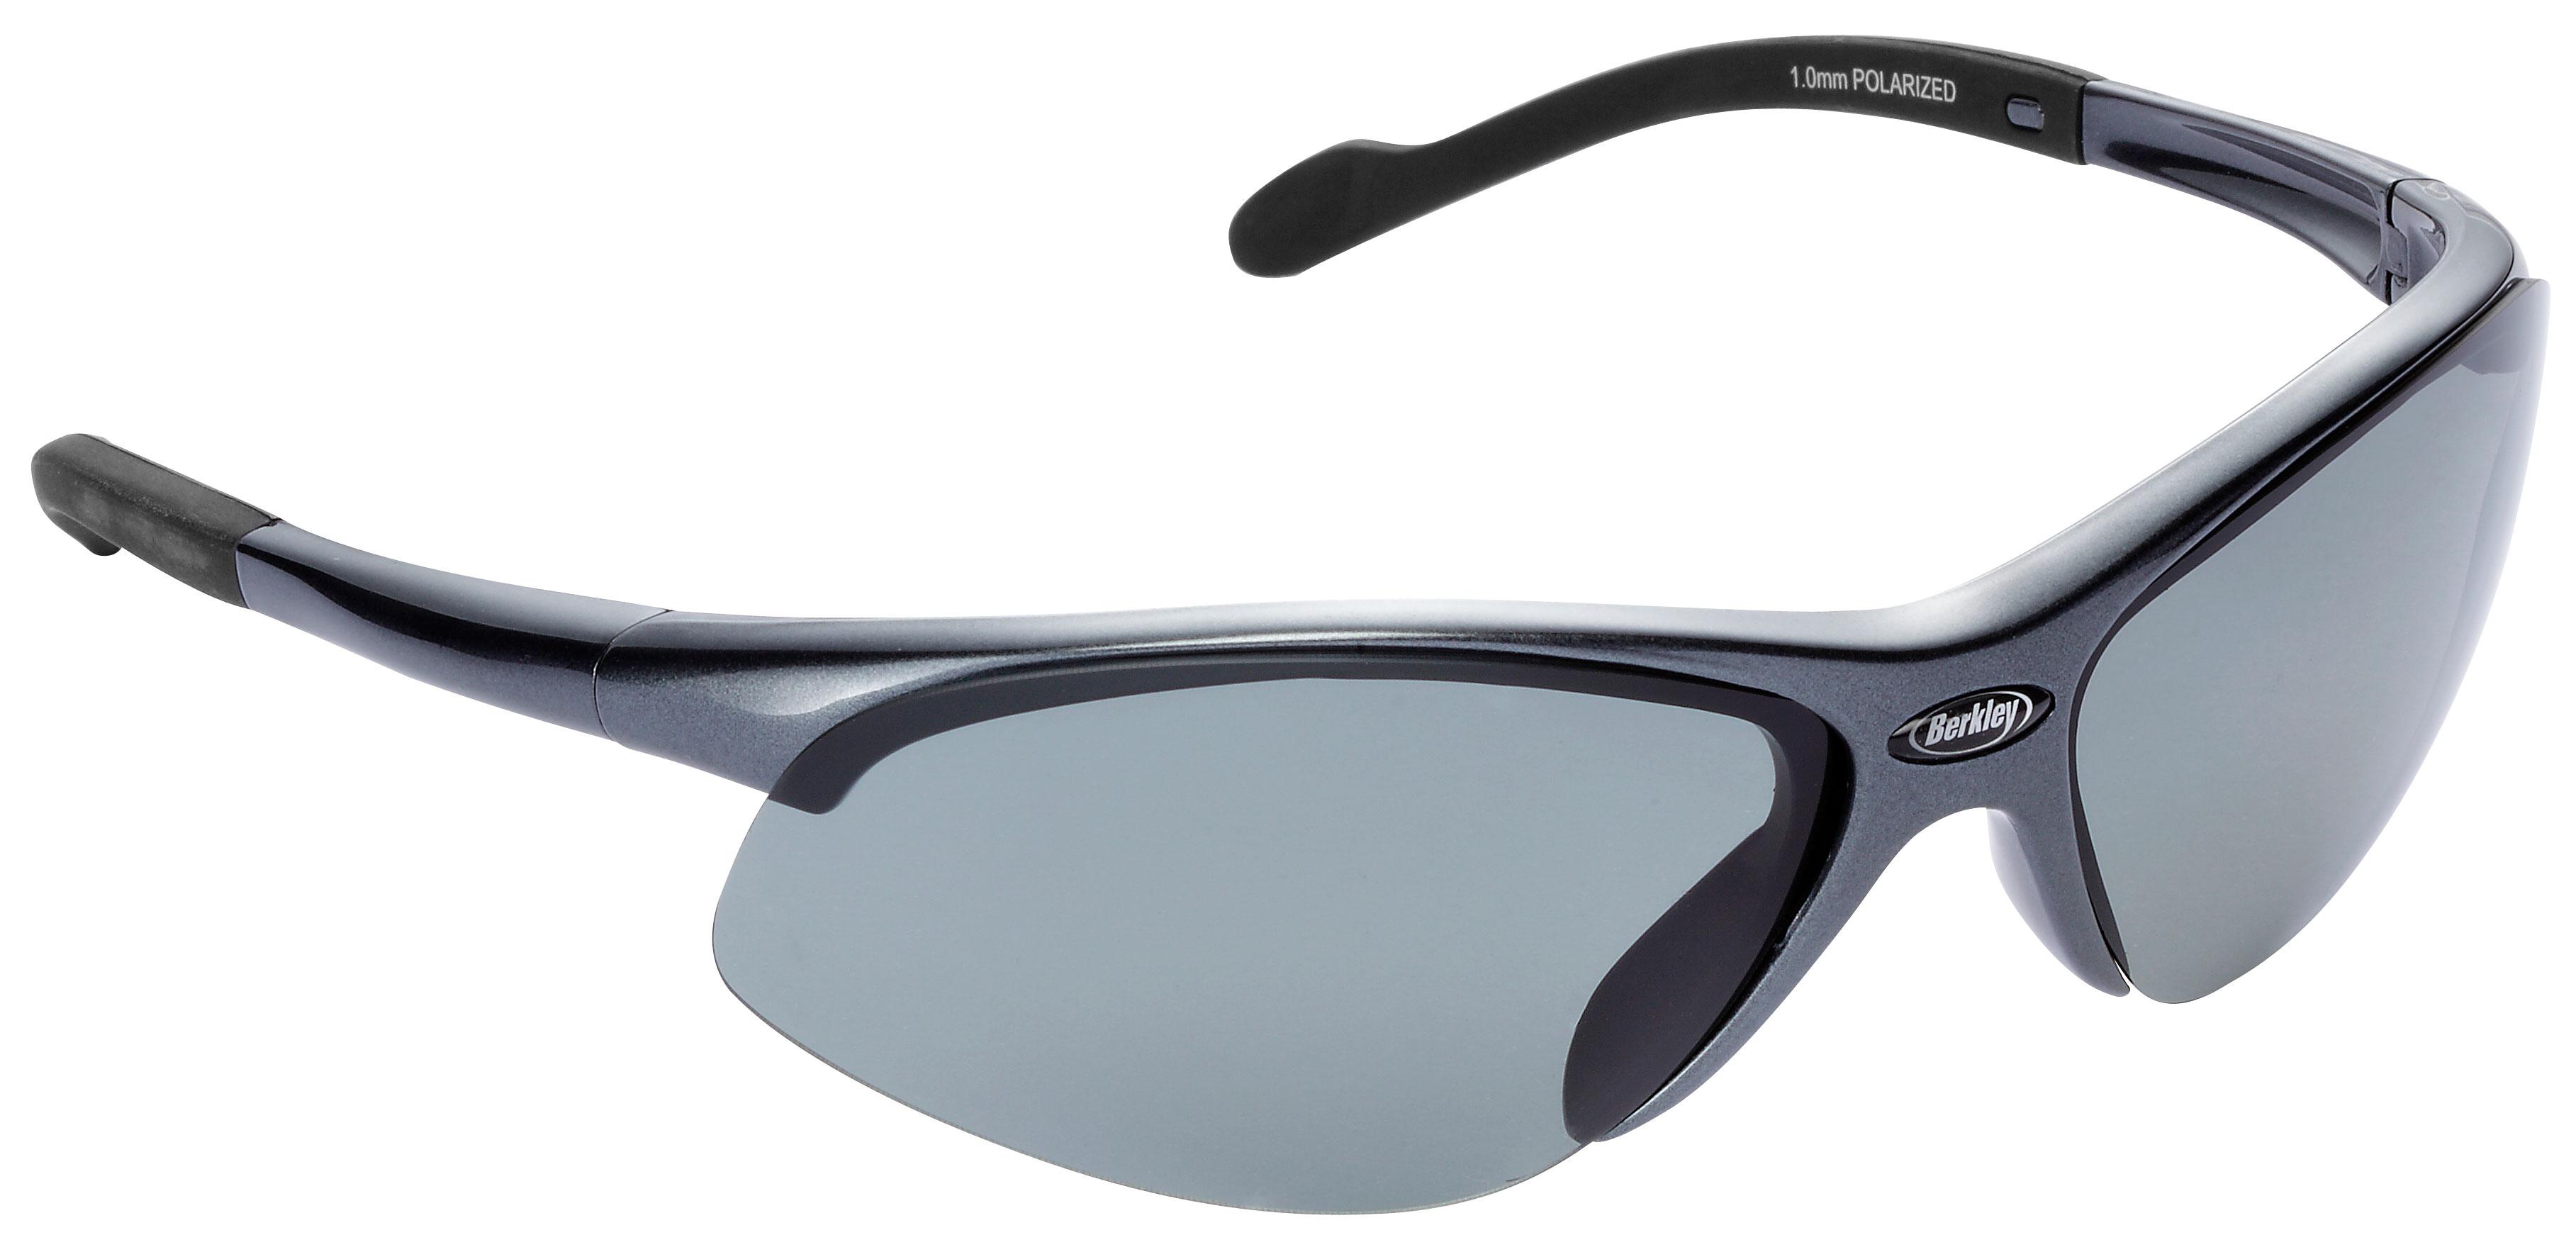 Berkley polarized fishing sunglasses southern wisconsin for Polarized bifocal fishing sunglasses